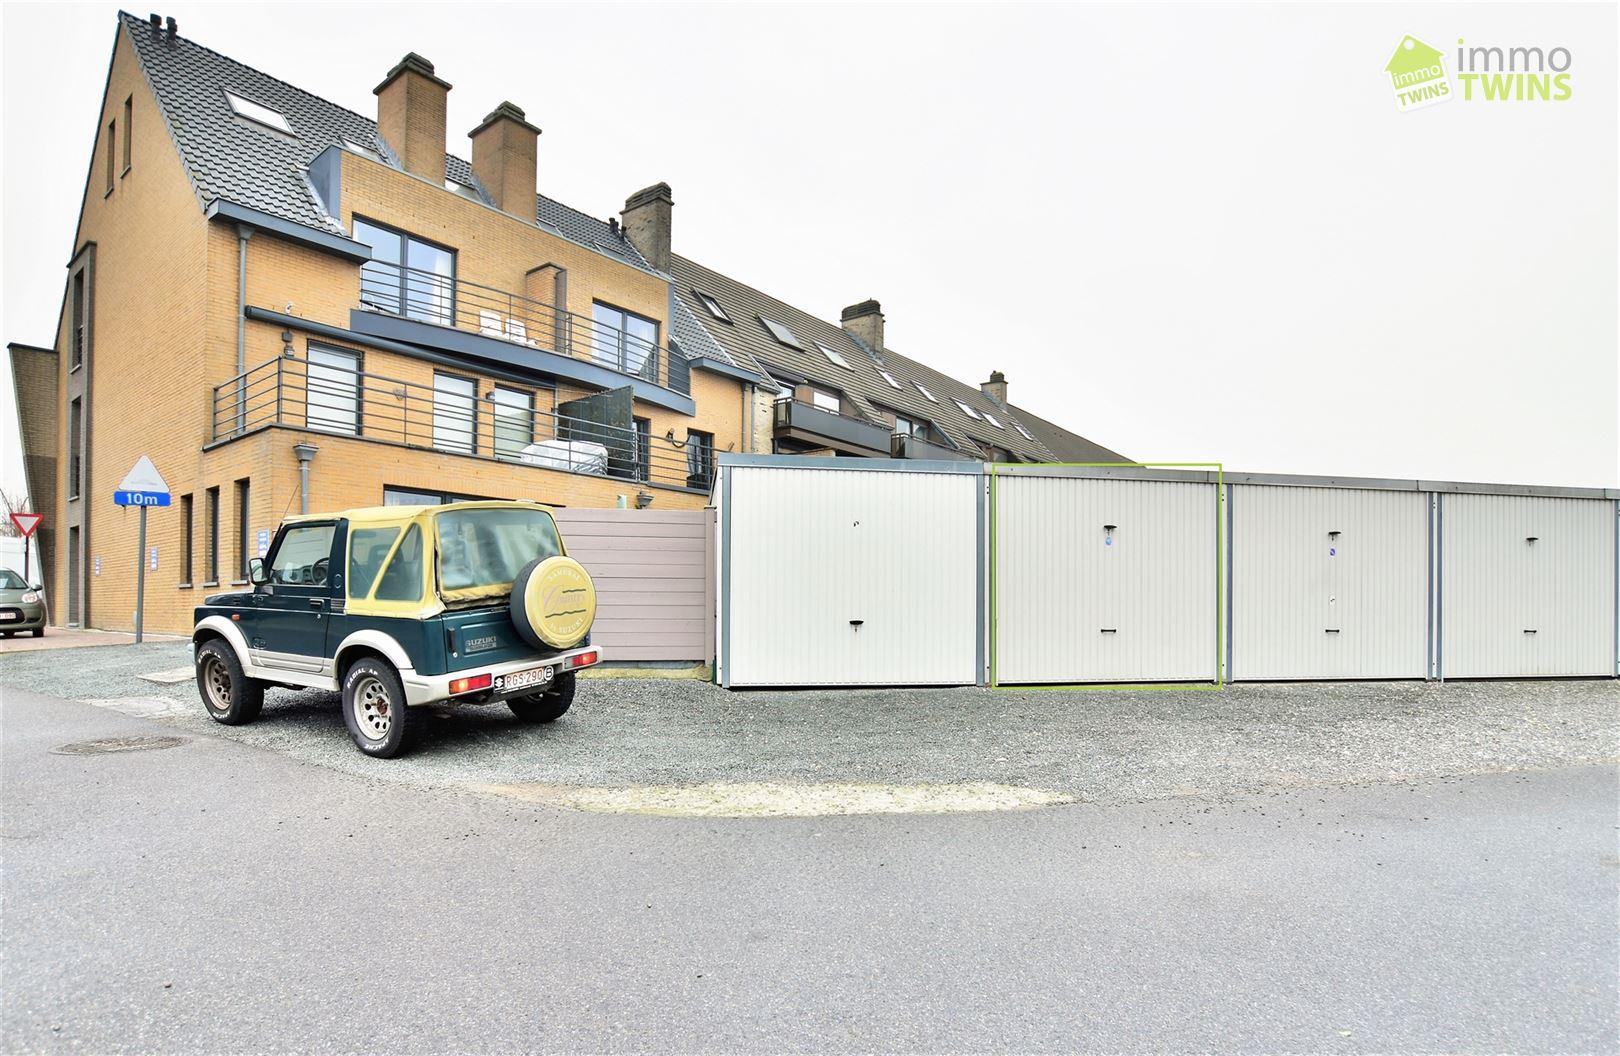 Foto 19 : Appartement te 9200 BAASRODE (België) - Prijs € 650